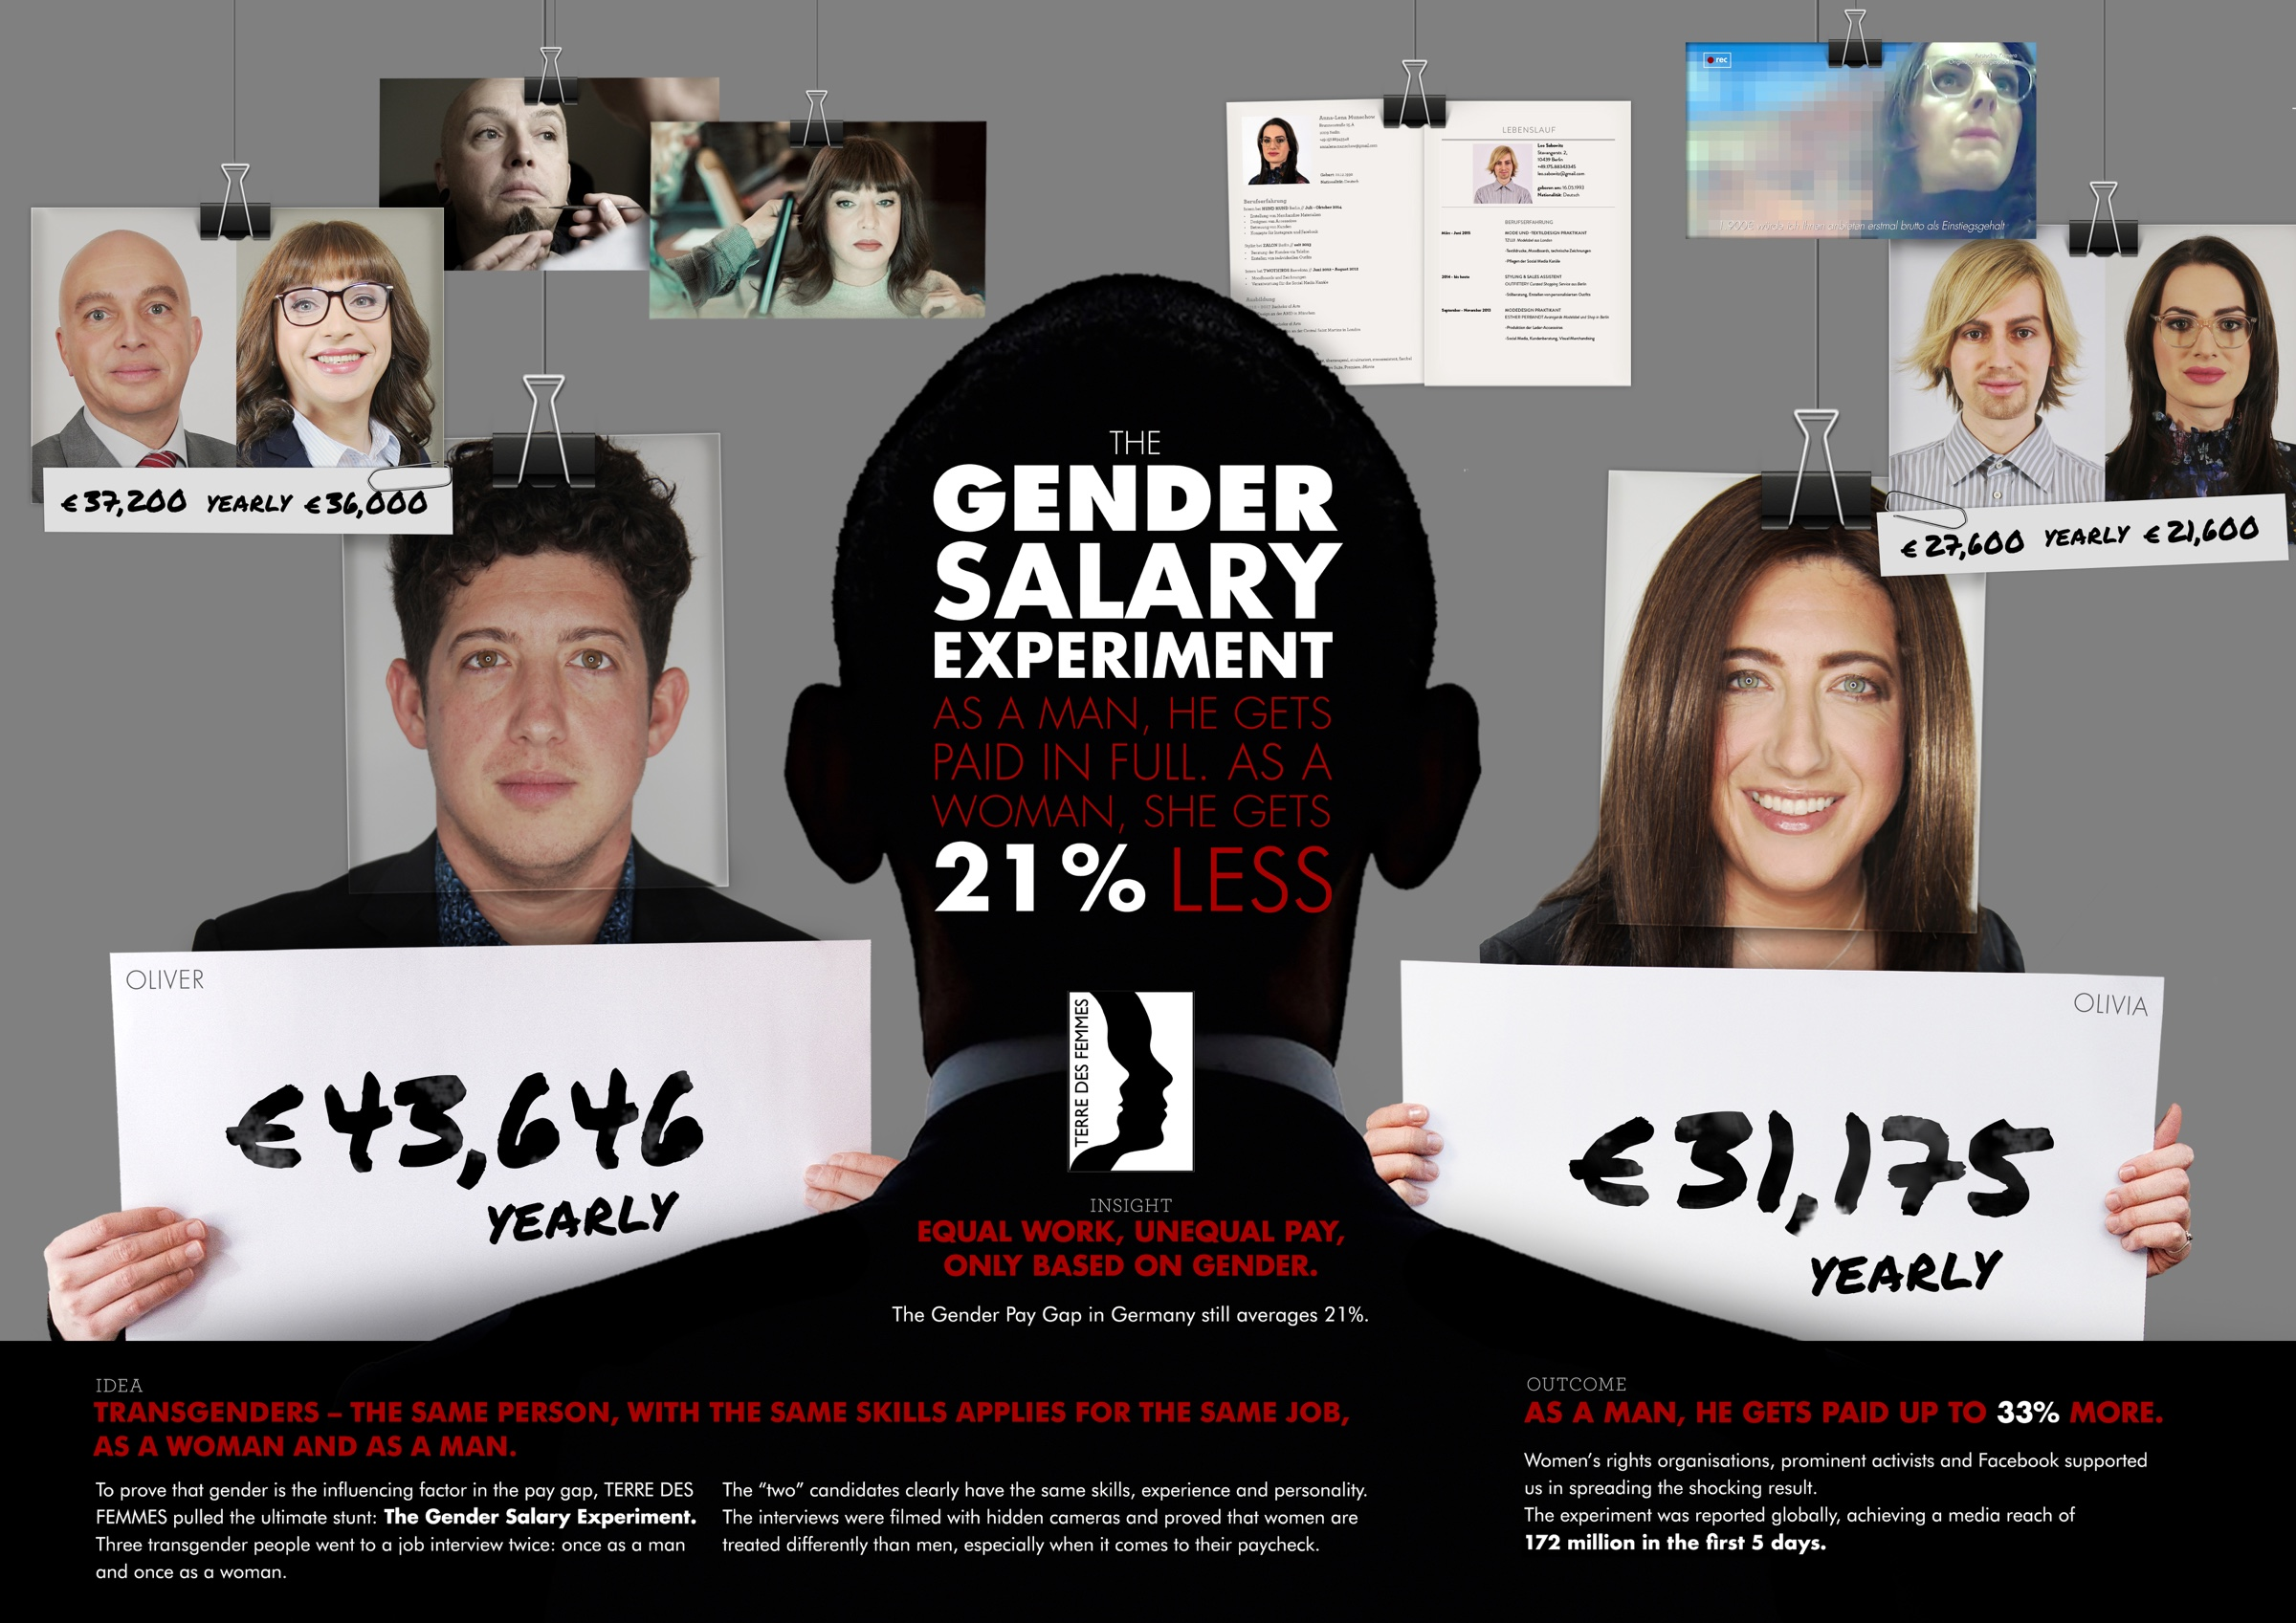 gender-salary-experiment-board.jpg